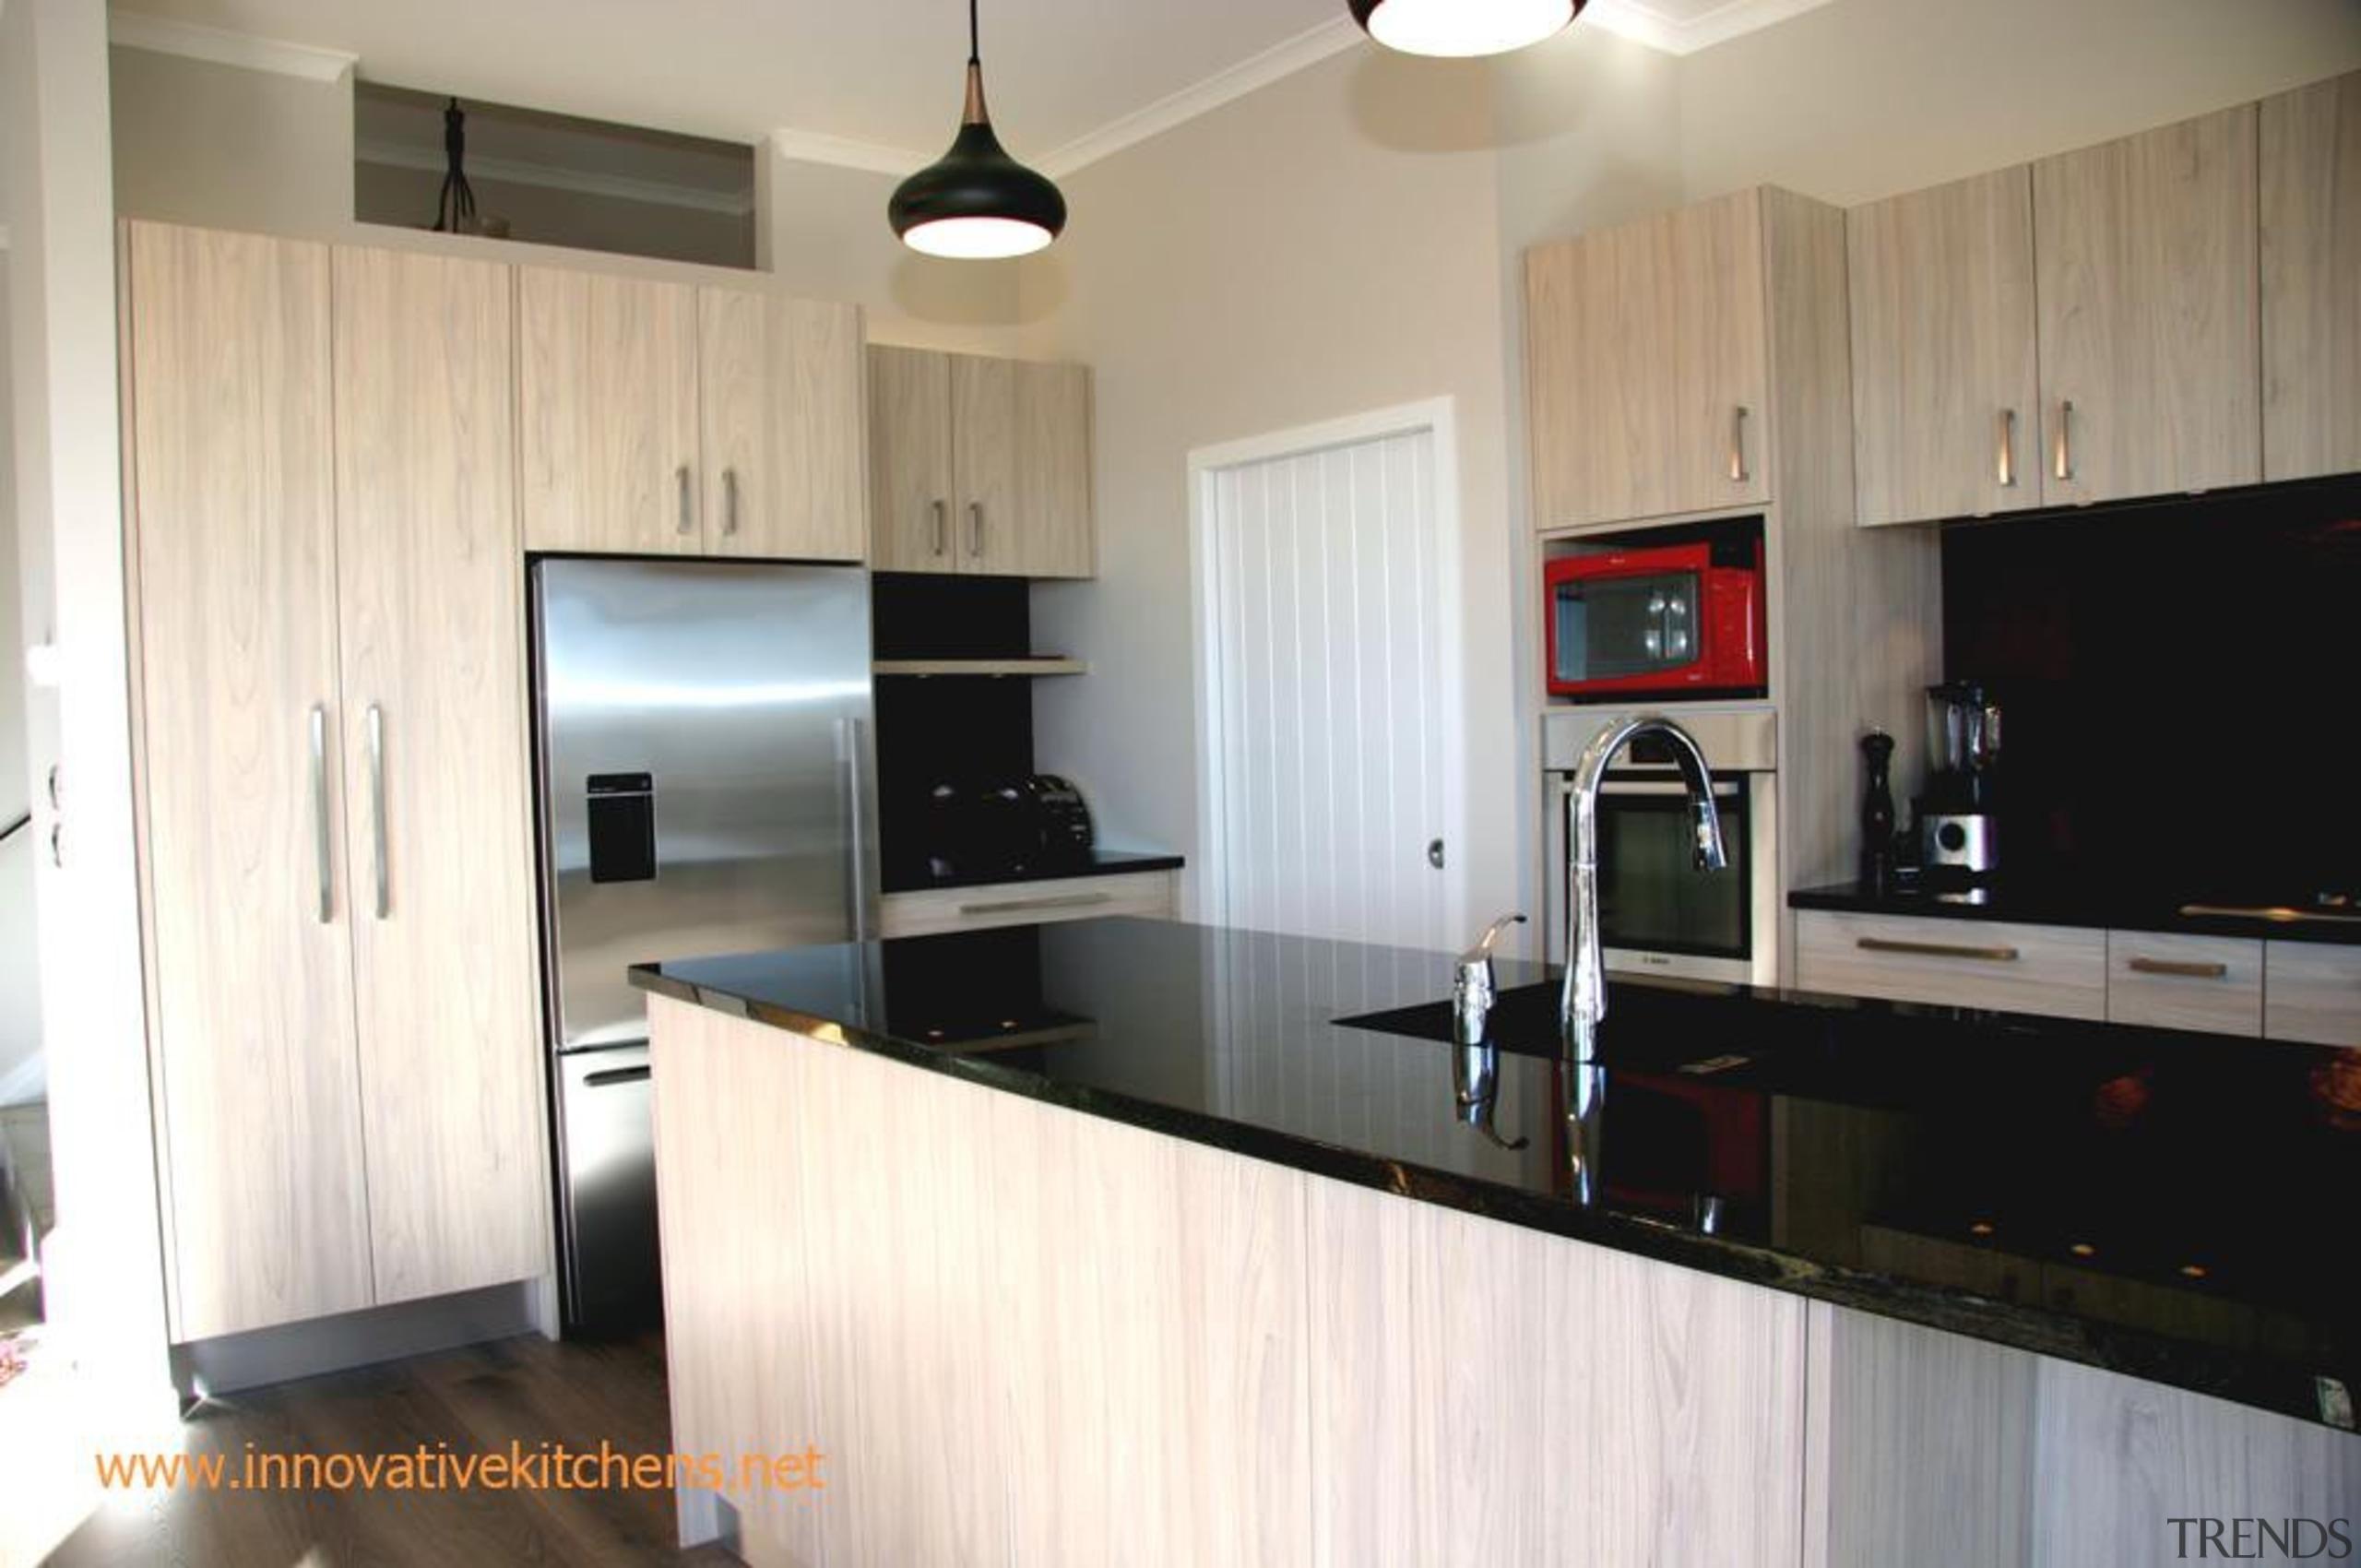 woodgrain melamine - woodgrain melamine - cabinetry | cabinetry, countertop, interior design, kitchen, property, real estate, room, white